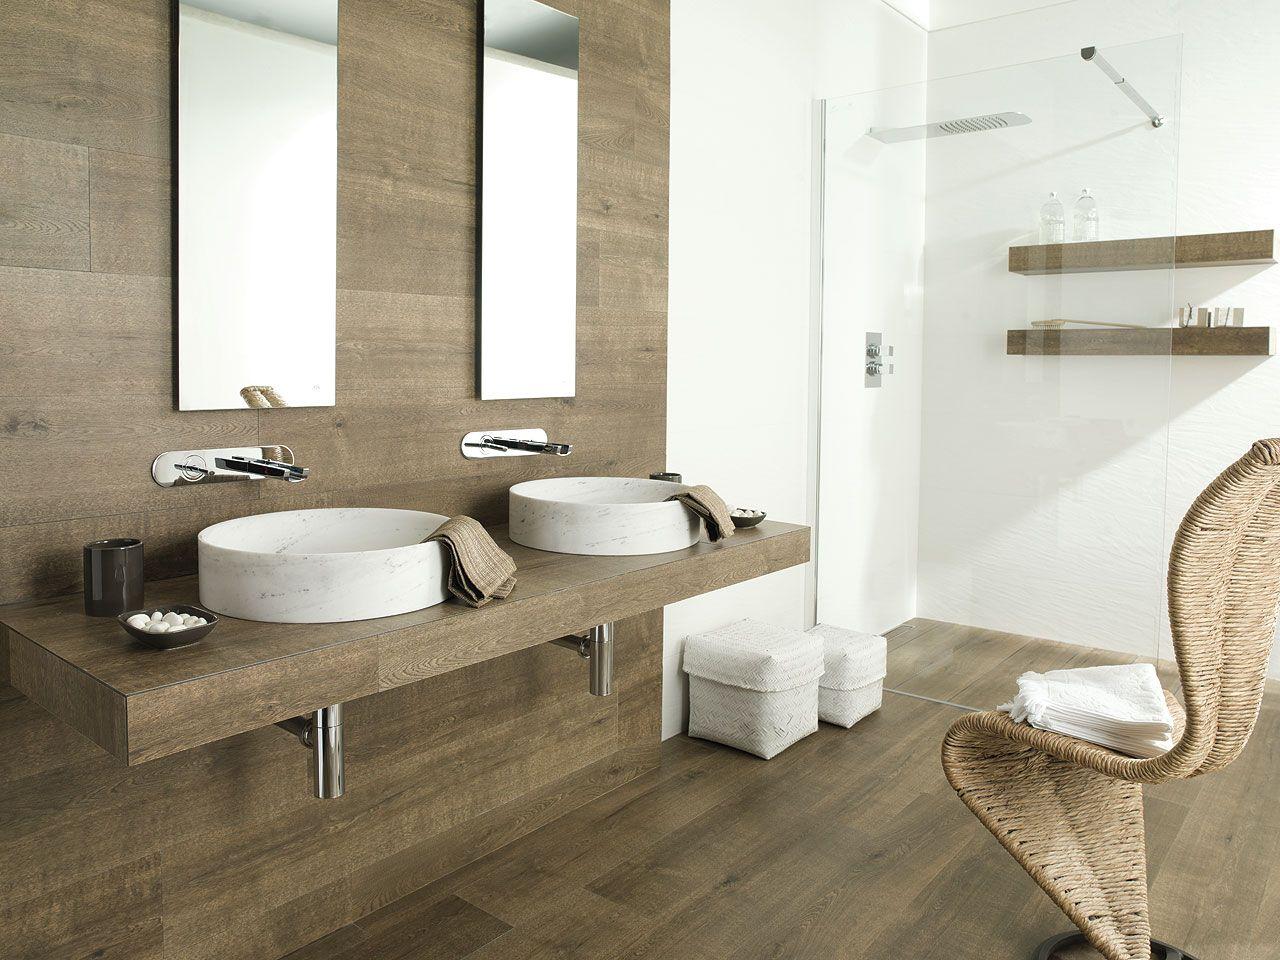 Cottage bathroom floors - Porcelanosa S Ceramic Tiles For Natural Stylish Bathroom Floor Tiles Par Ker Montana Cottage